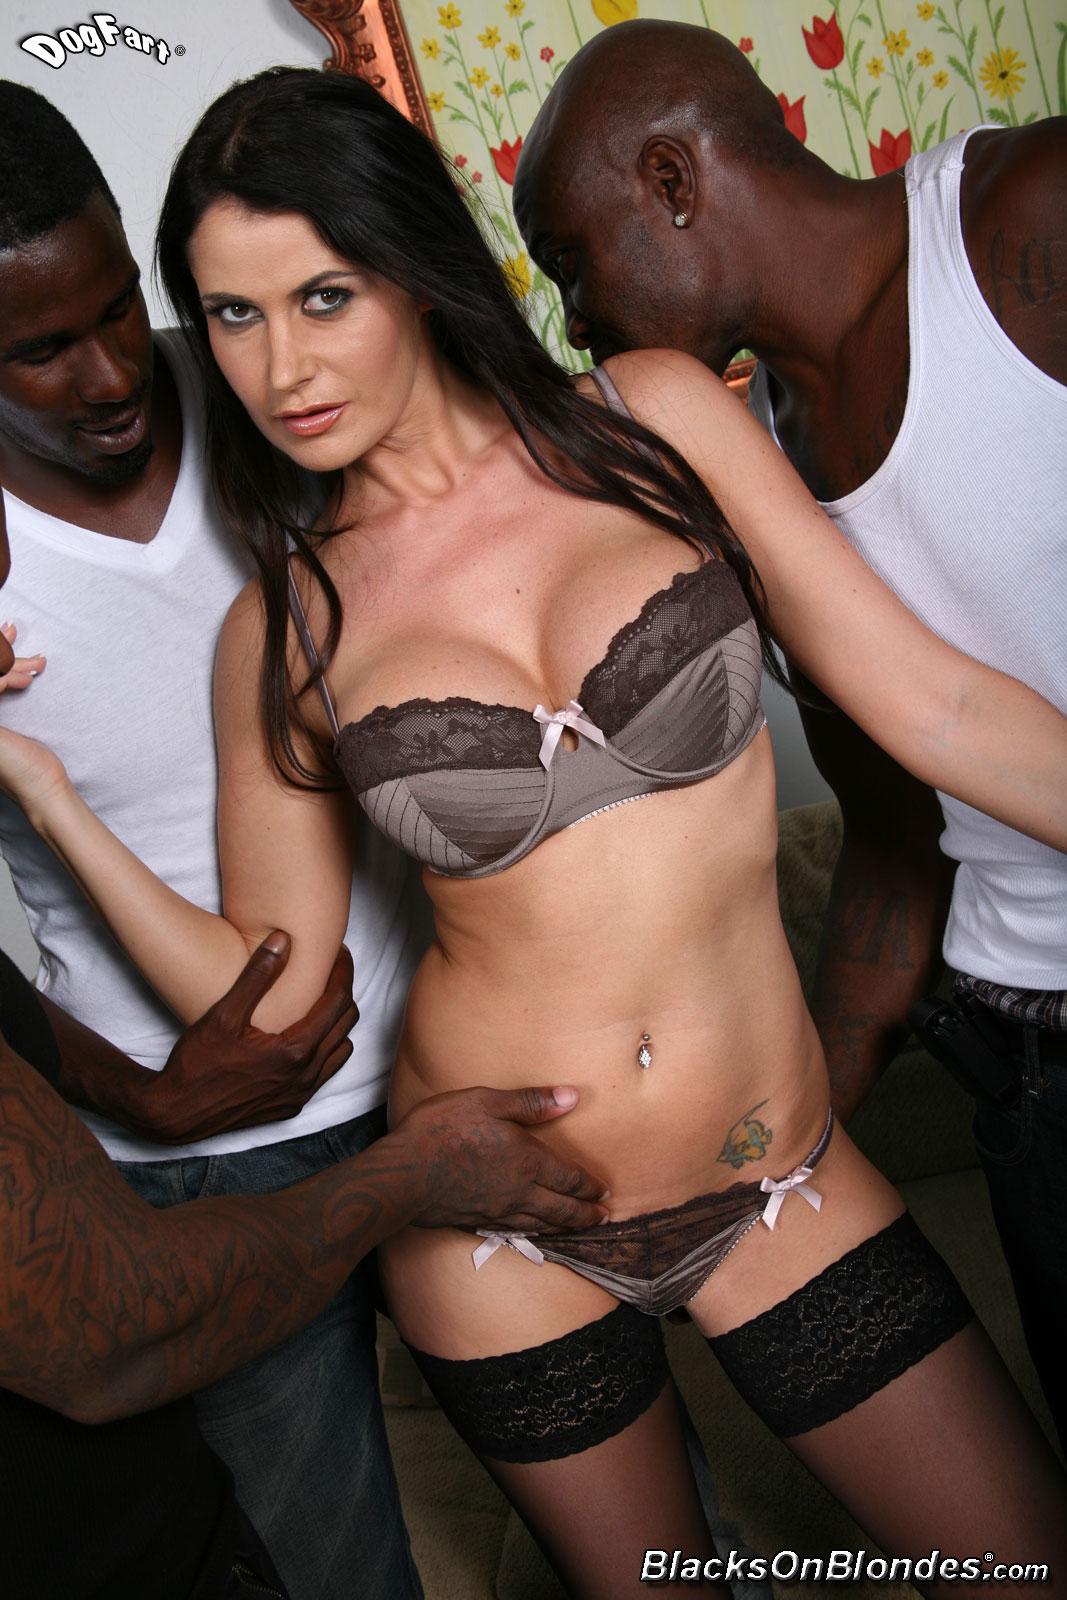 4 Porn Ganbang gang bang xxx euroslut in interracial 4-0n-1 gangbang cumeating